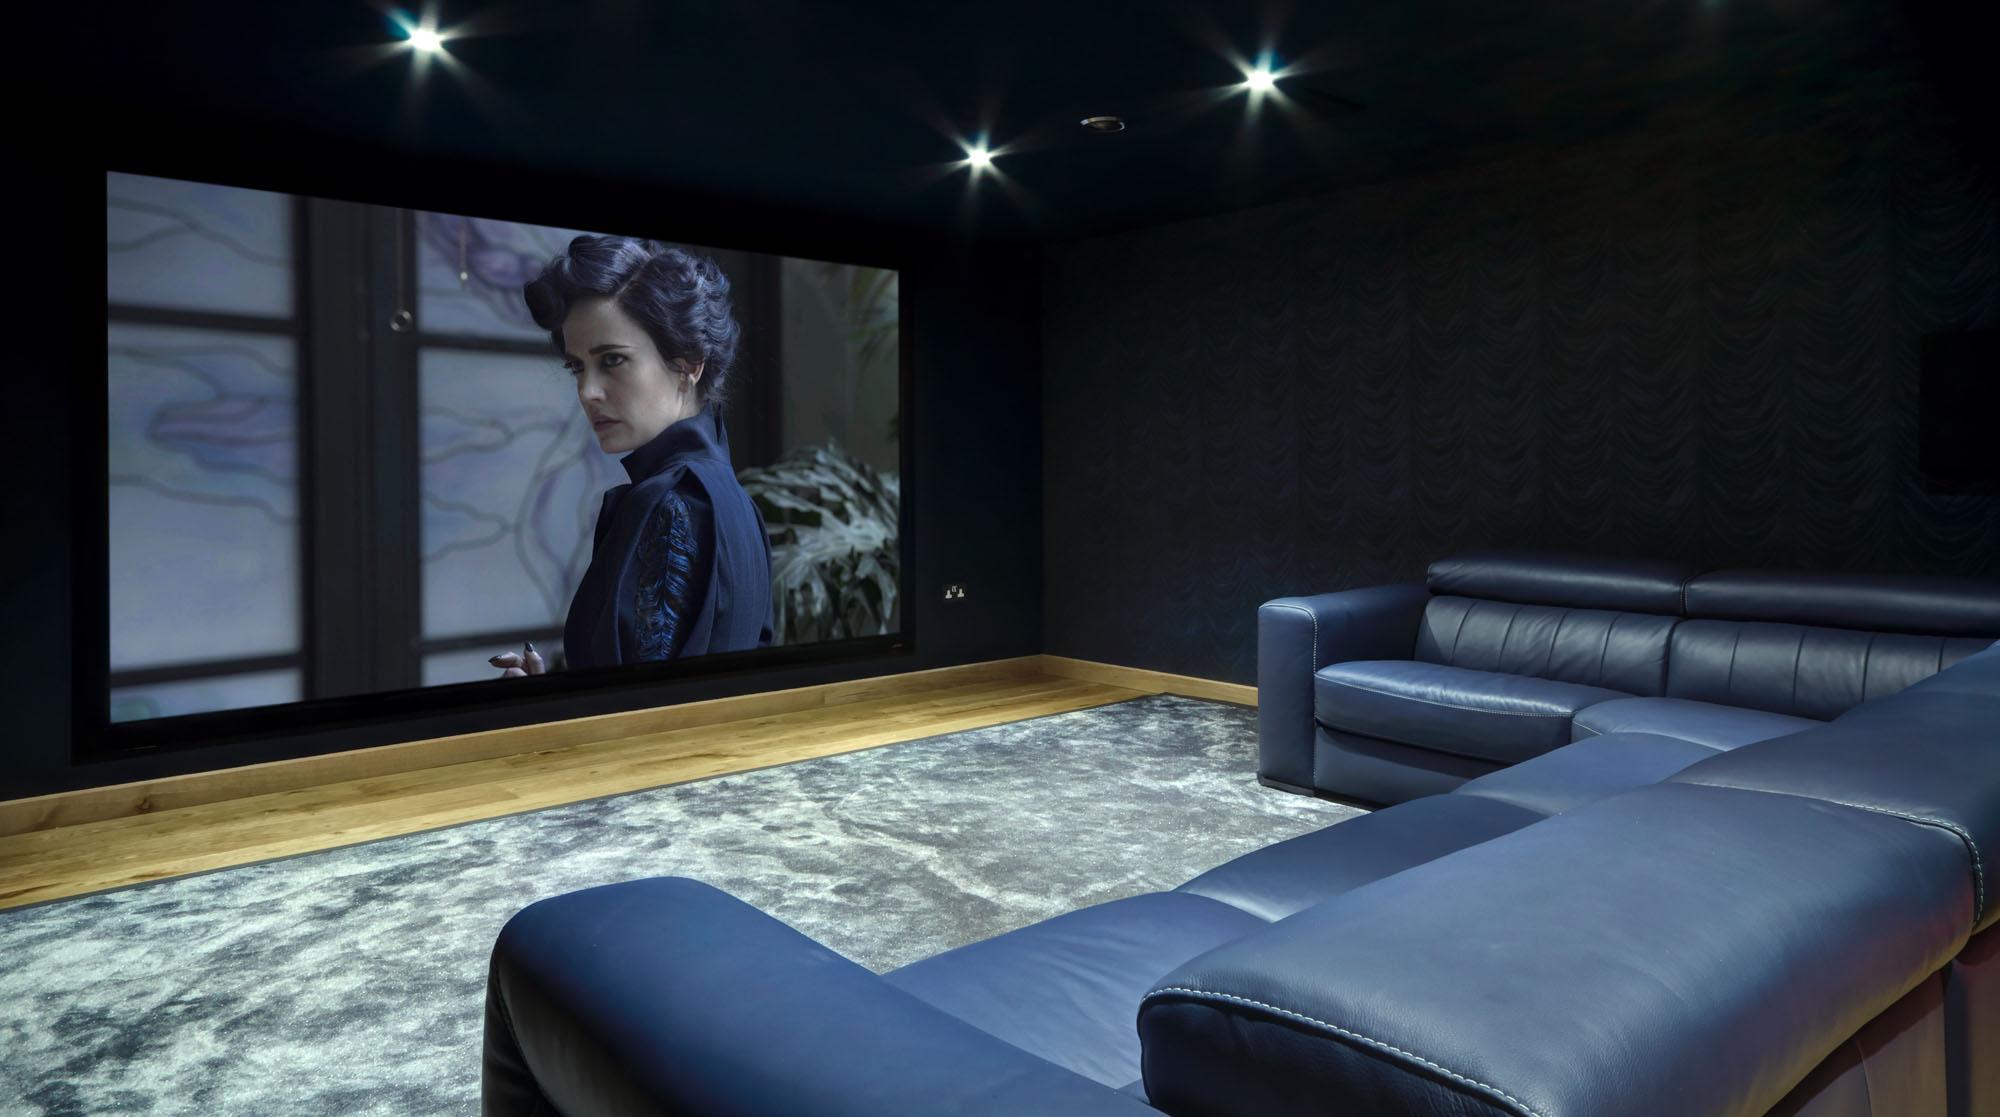 Artcoustic_Home_Cinema_Modus_Vivendi-1.jpg